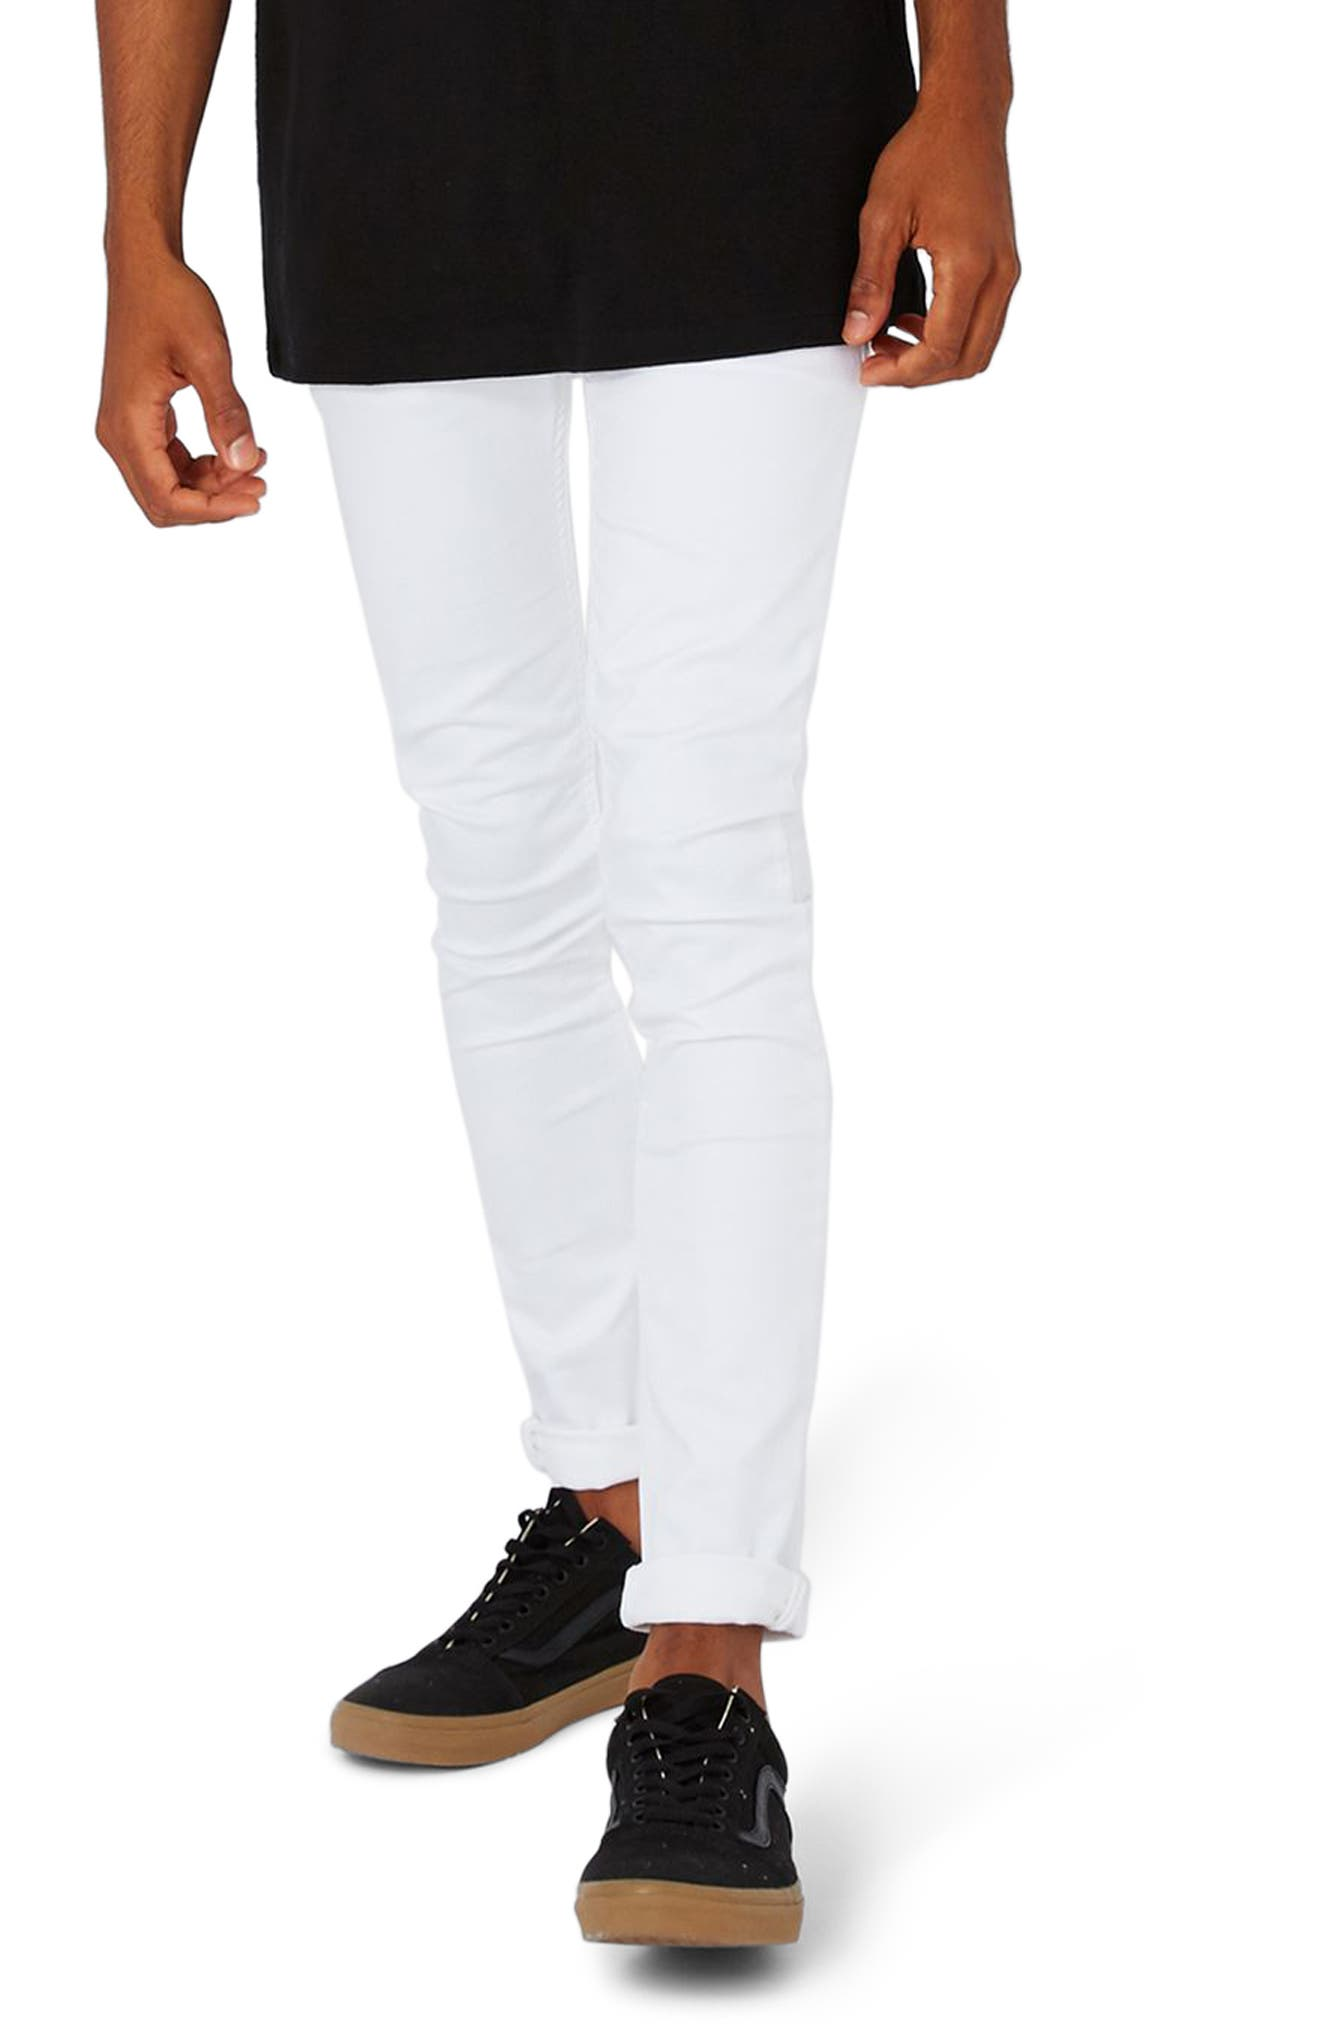 Topman White Spray-On Skinny Jeans